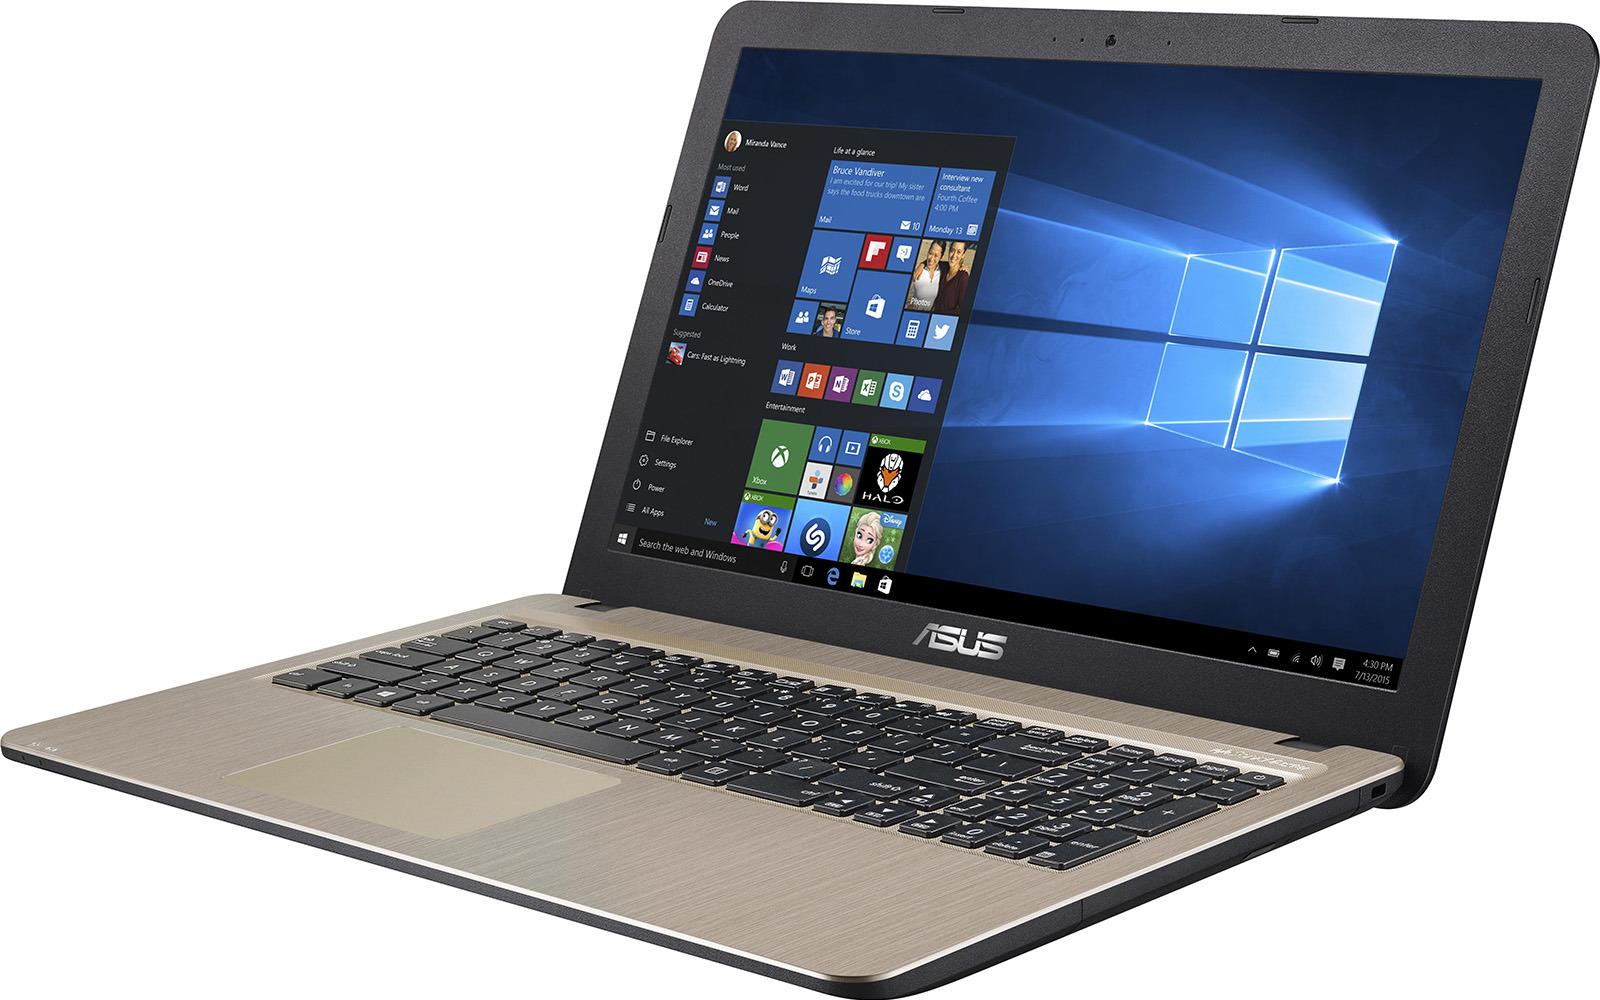 цена на 15.6 Ноутбук ASUS X540UB 90NB0IM1-M03630, черный